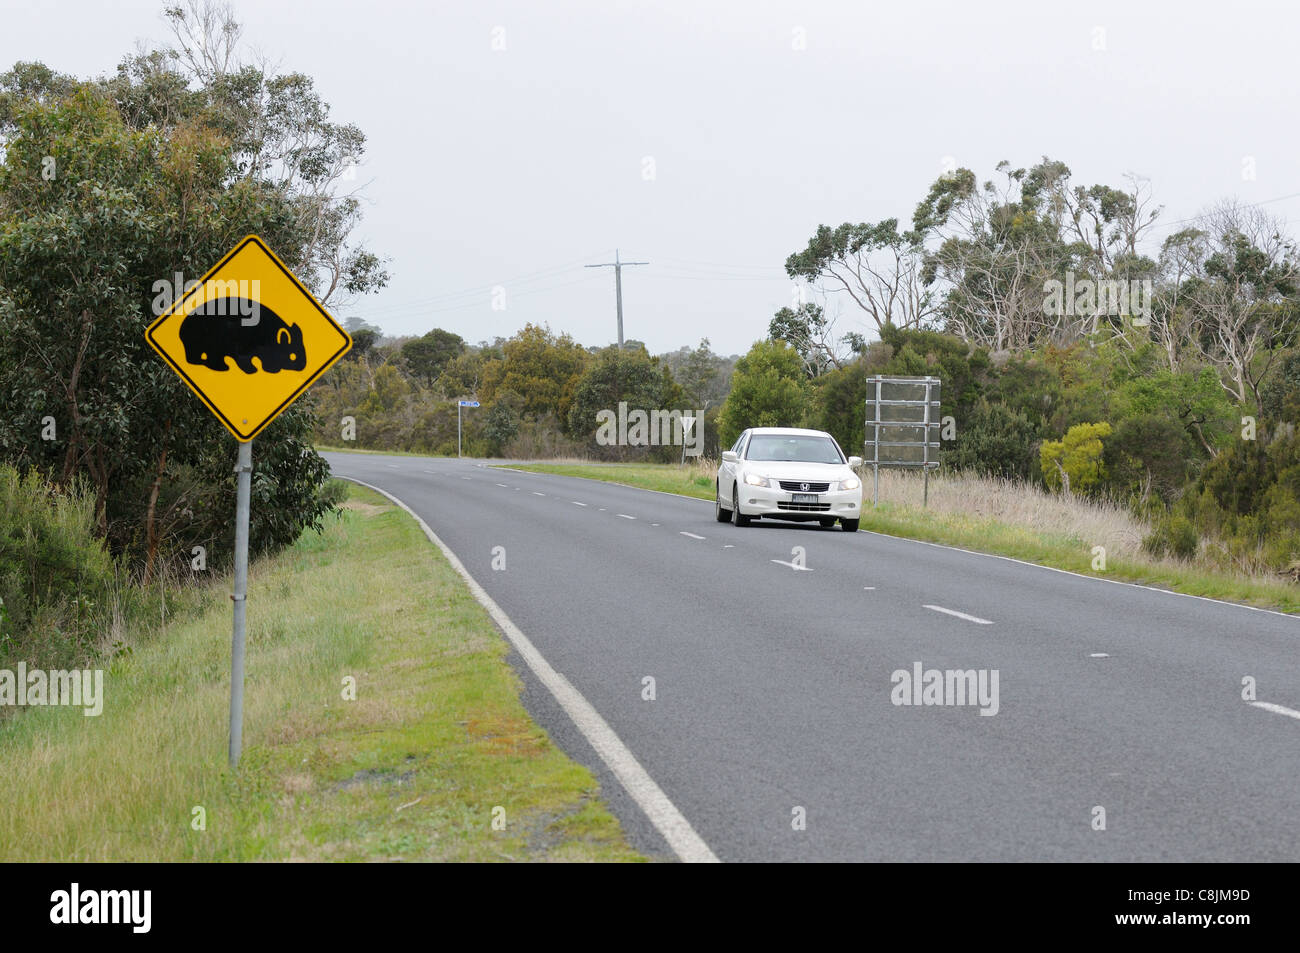 Wombat cartello stradale fotografato in Australia meridionale Immagini Stock